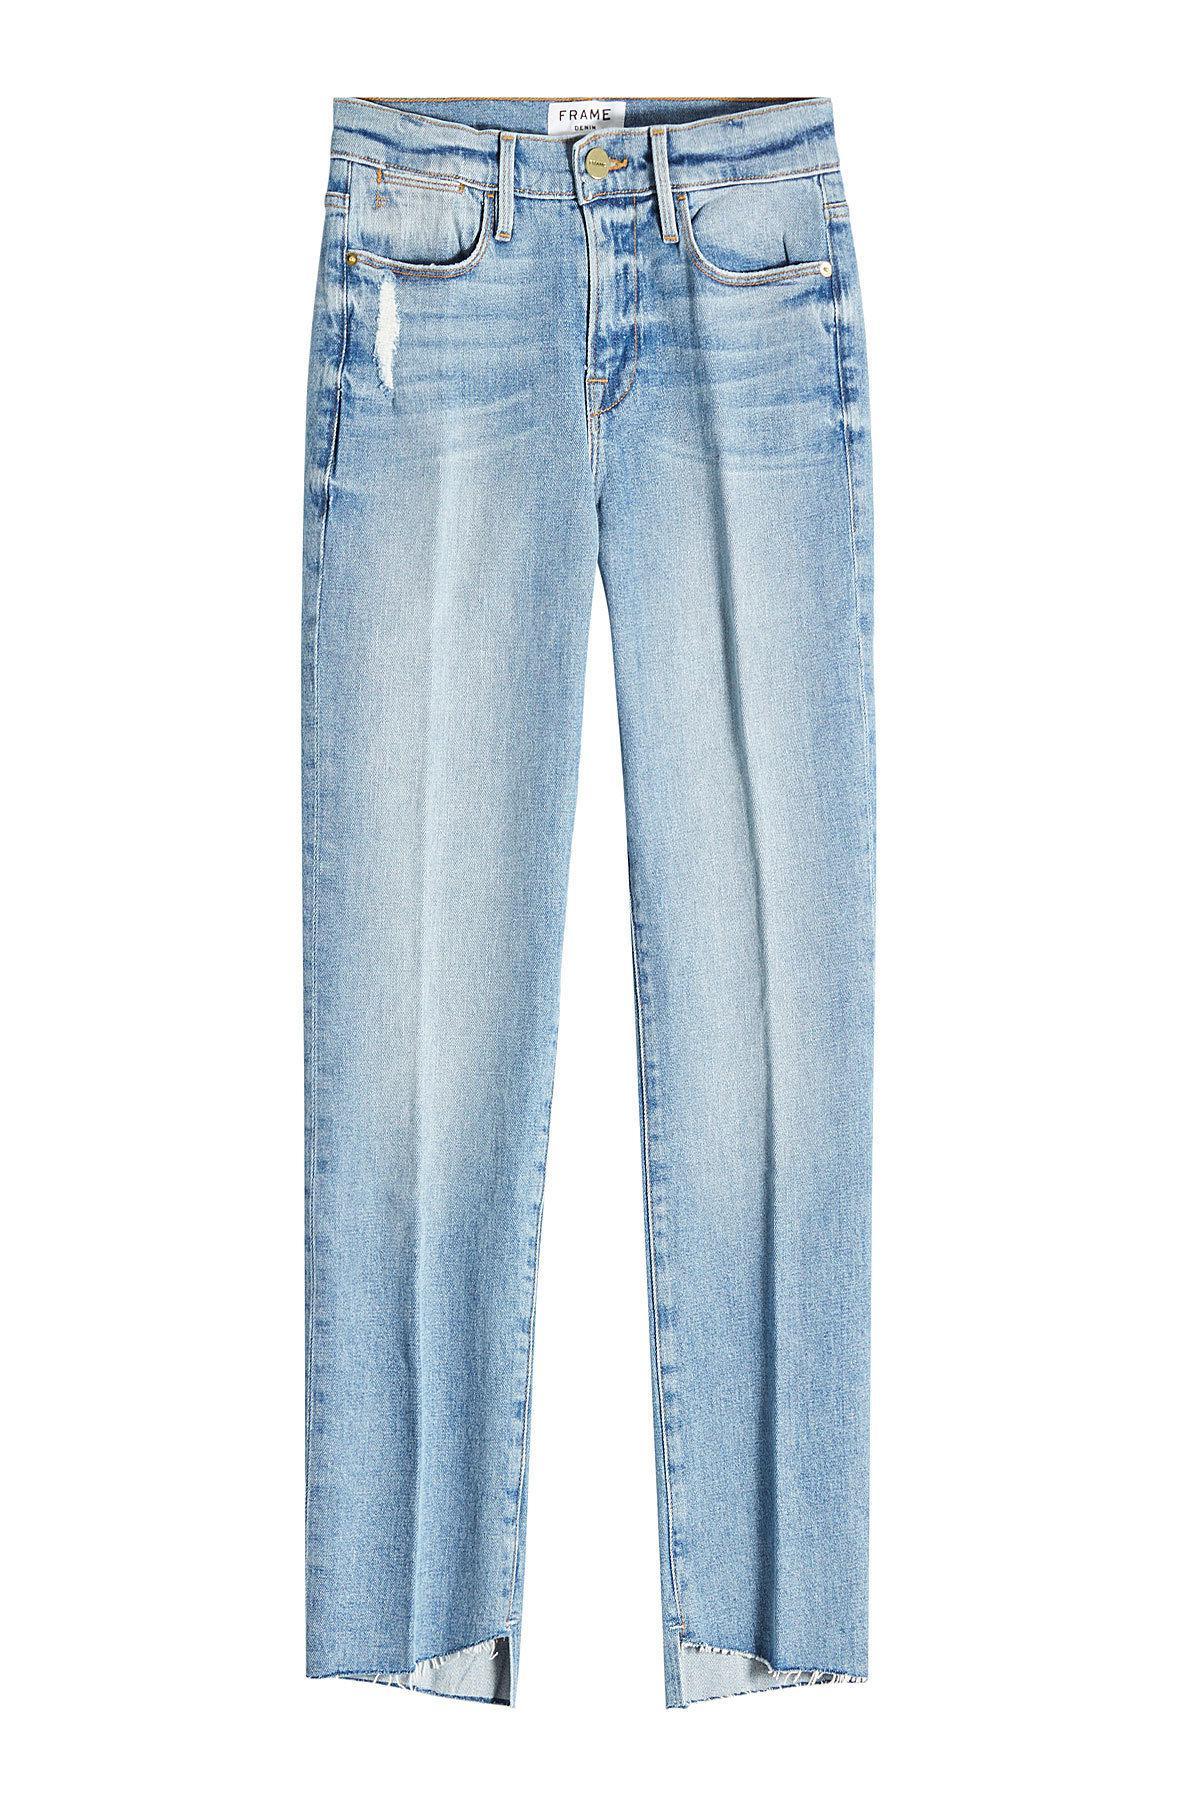 distressed straight leg jeans - Blue Frame Denim PmLEXvHHC5